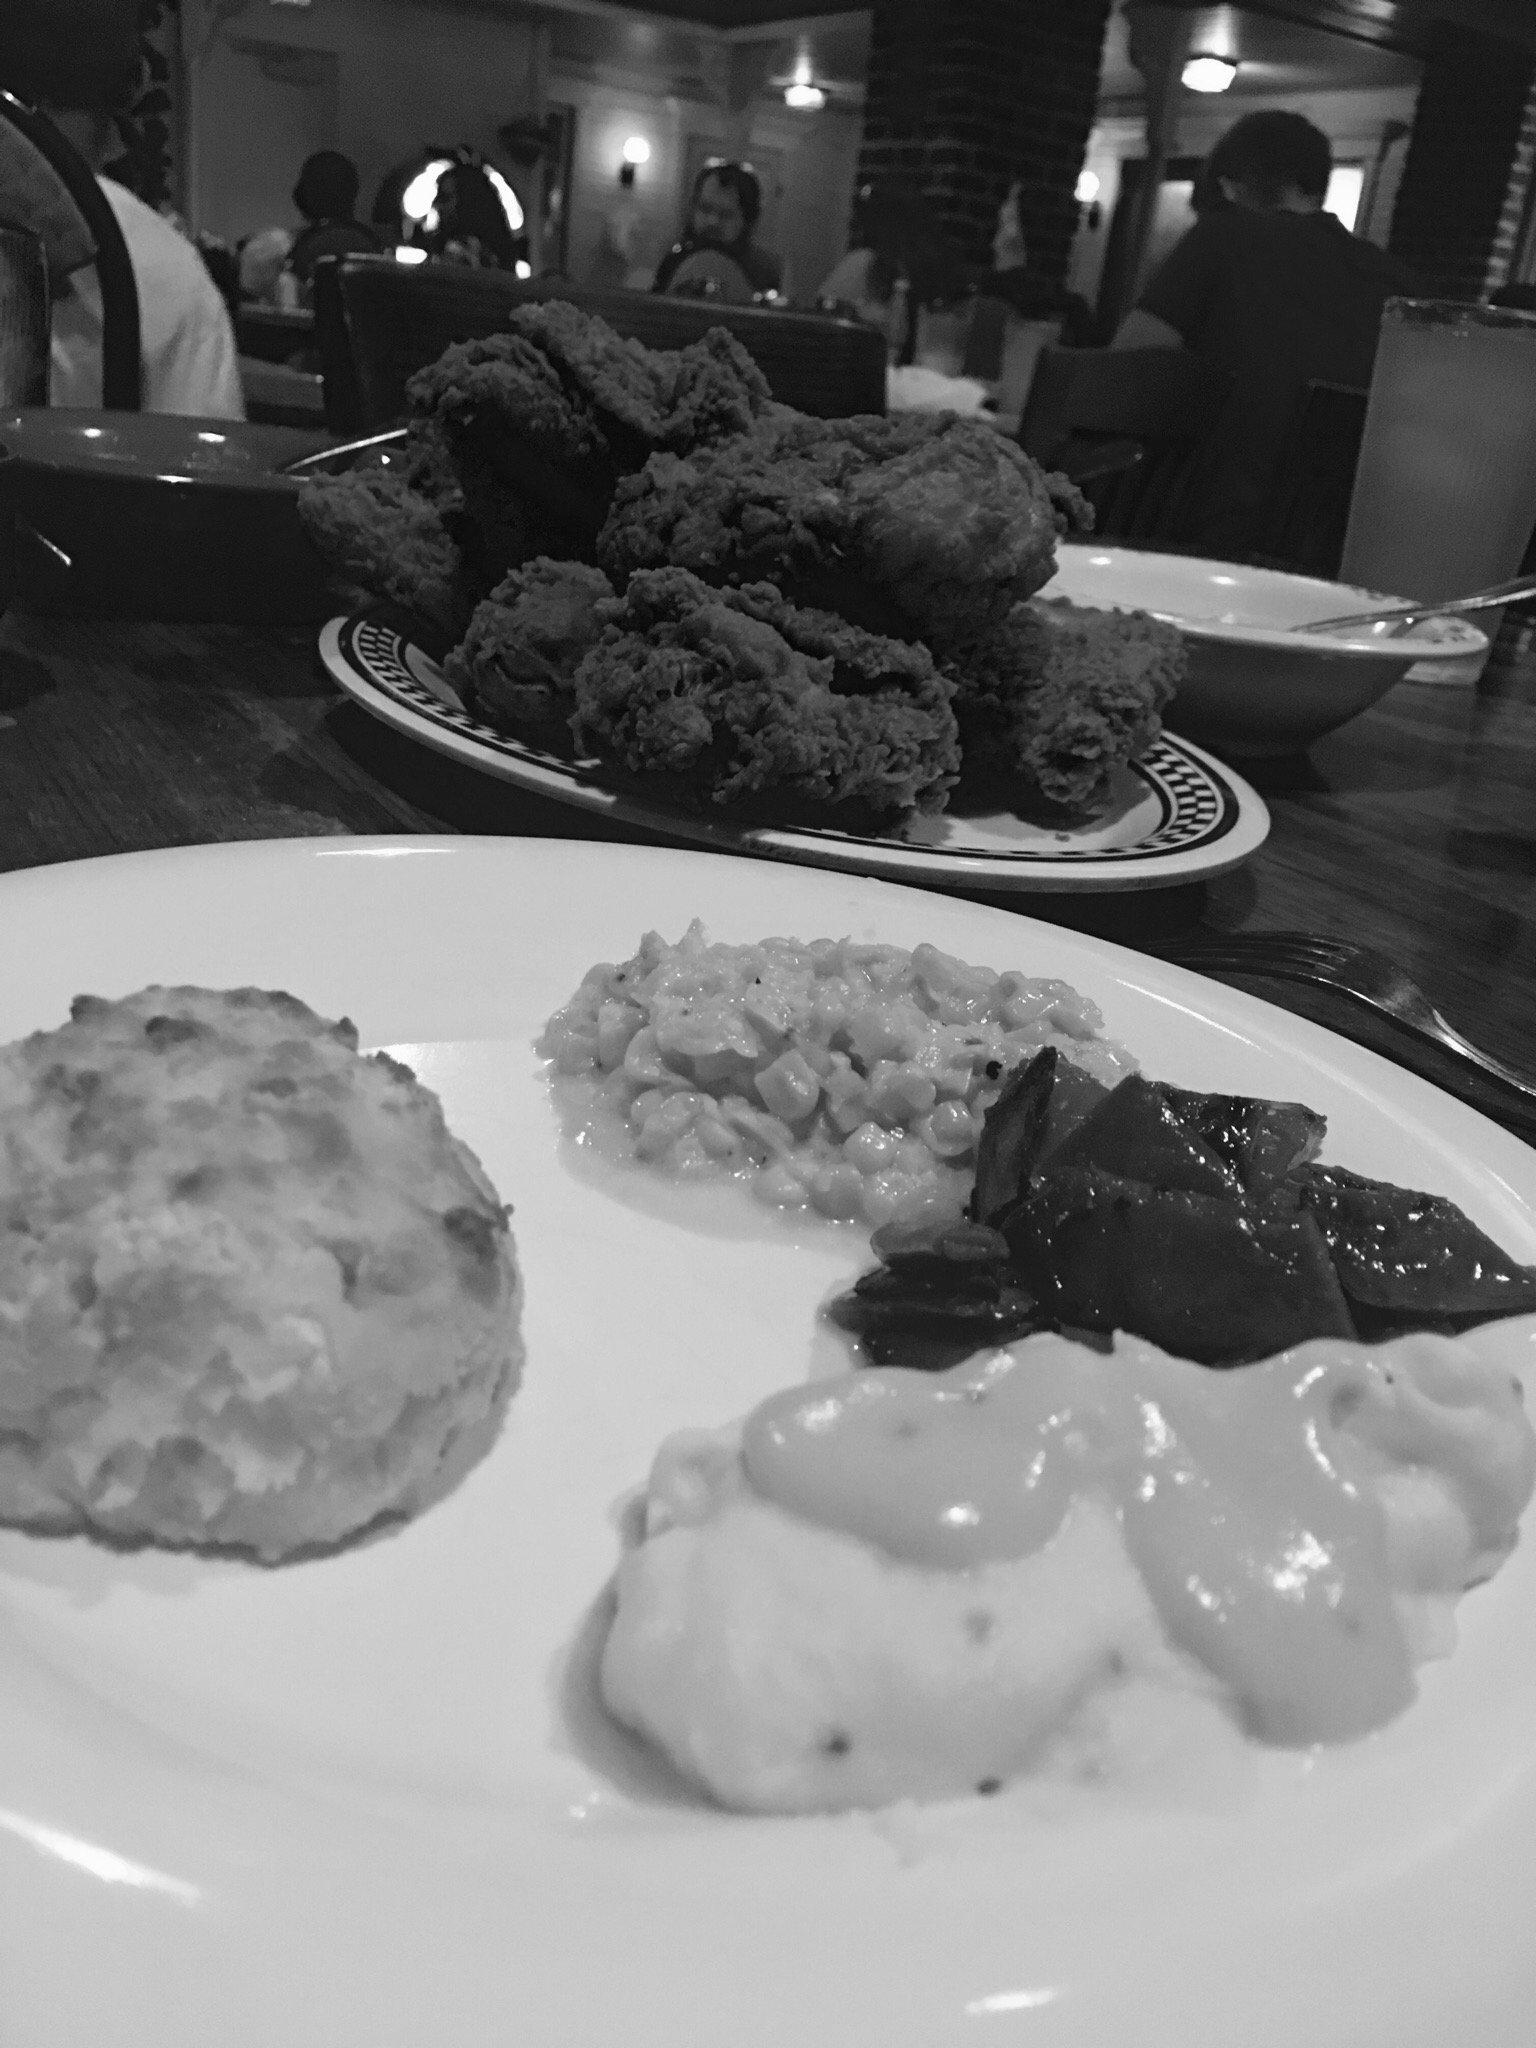 babe's chicken dinner house, arlington - menu, prices & restaurant